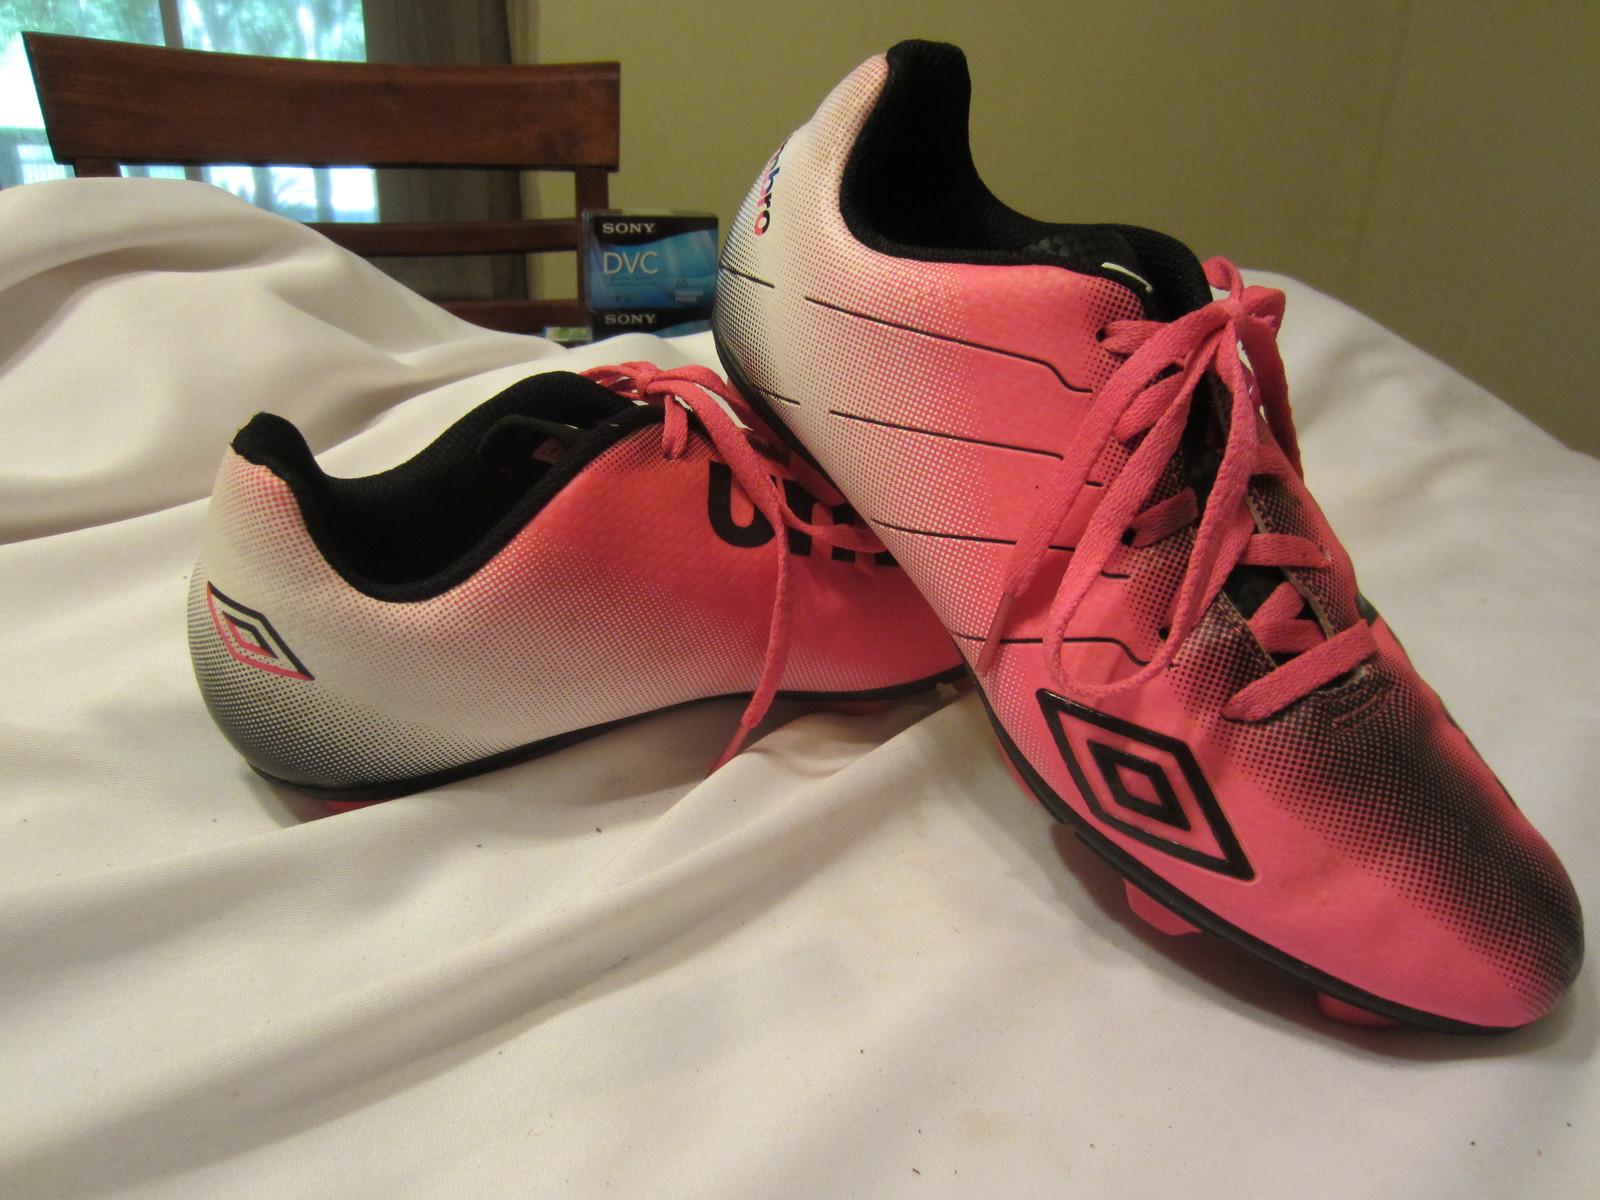 0202c4403e7c Umbro Girls Arturo Soccer Cleats Size: 6 and 38 similar items